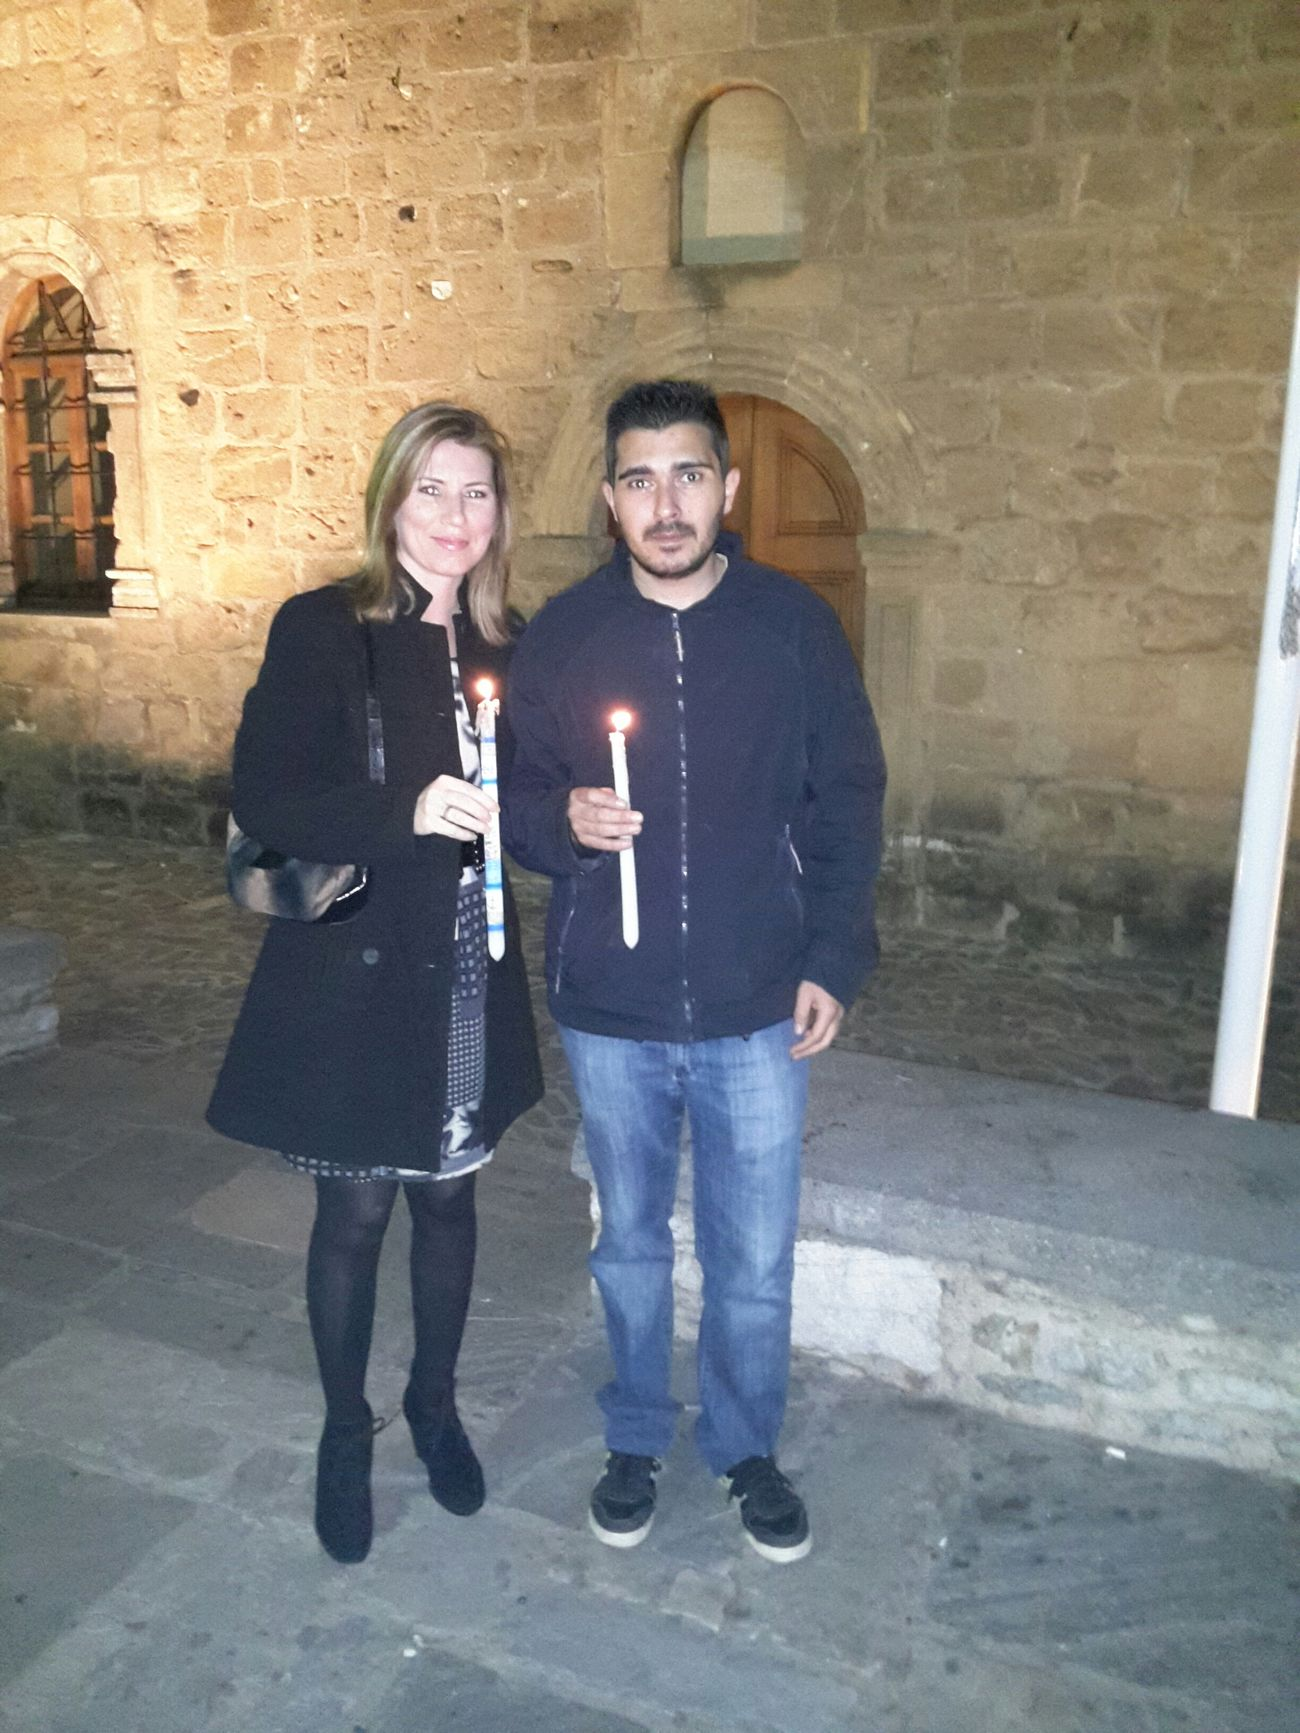 Easter Kalamata Friends Praising The Lord Light Greece